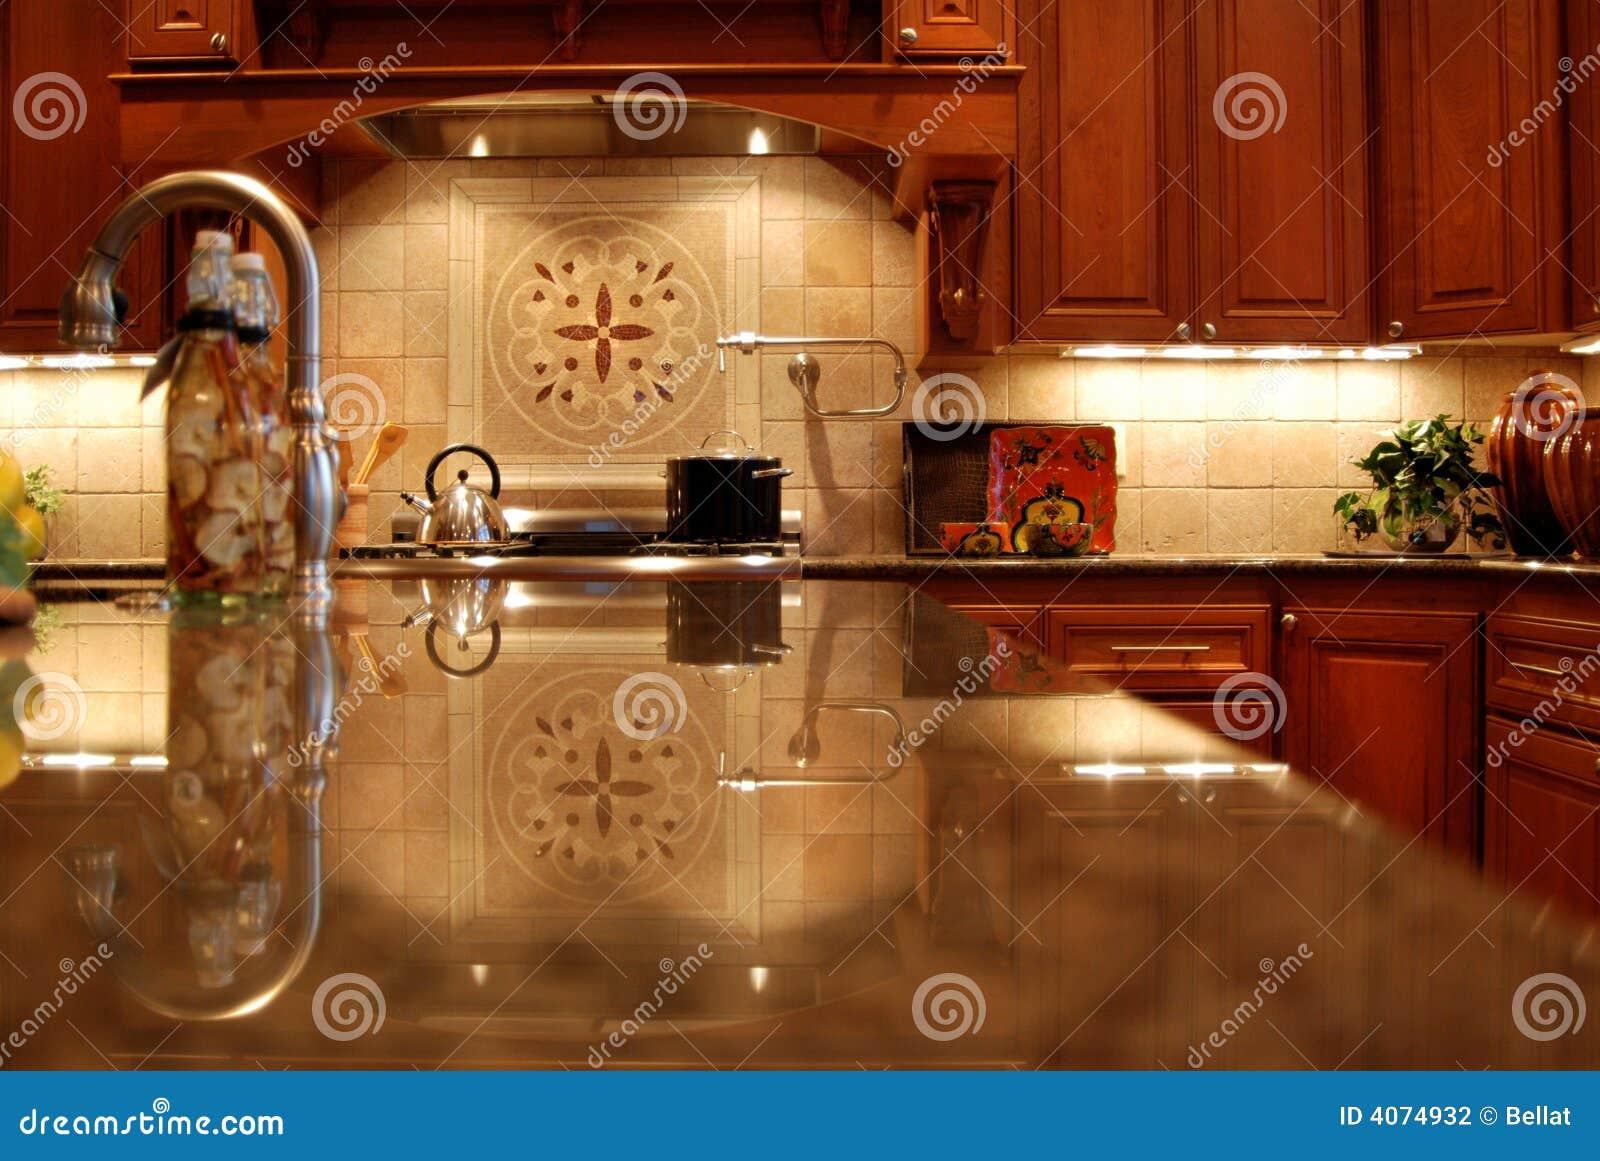 Million Dollar Kitchen Stock Photo Image Of Newly 4074932